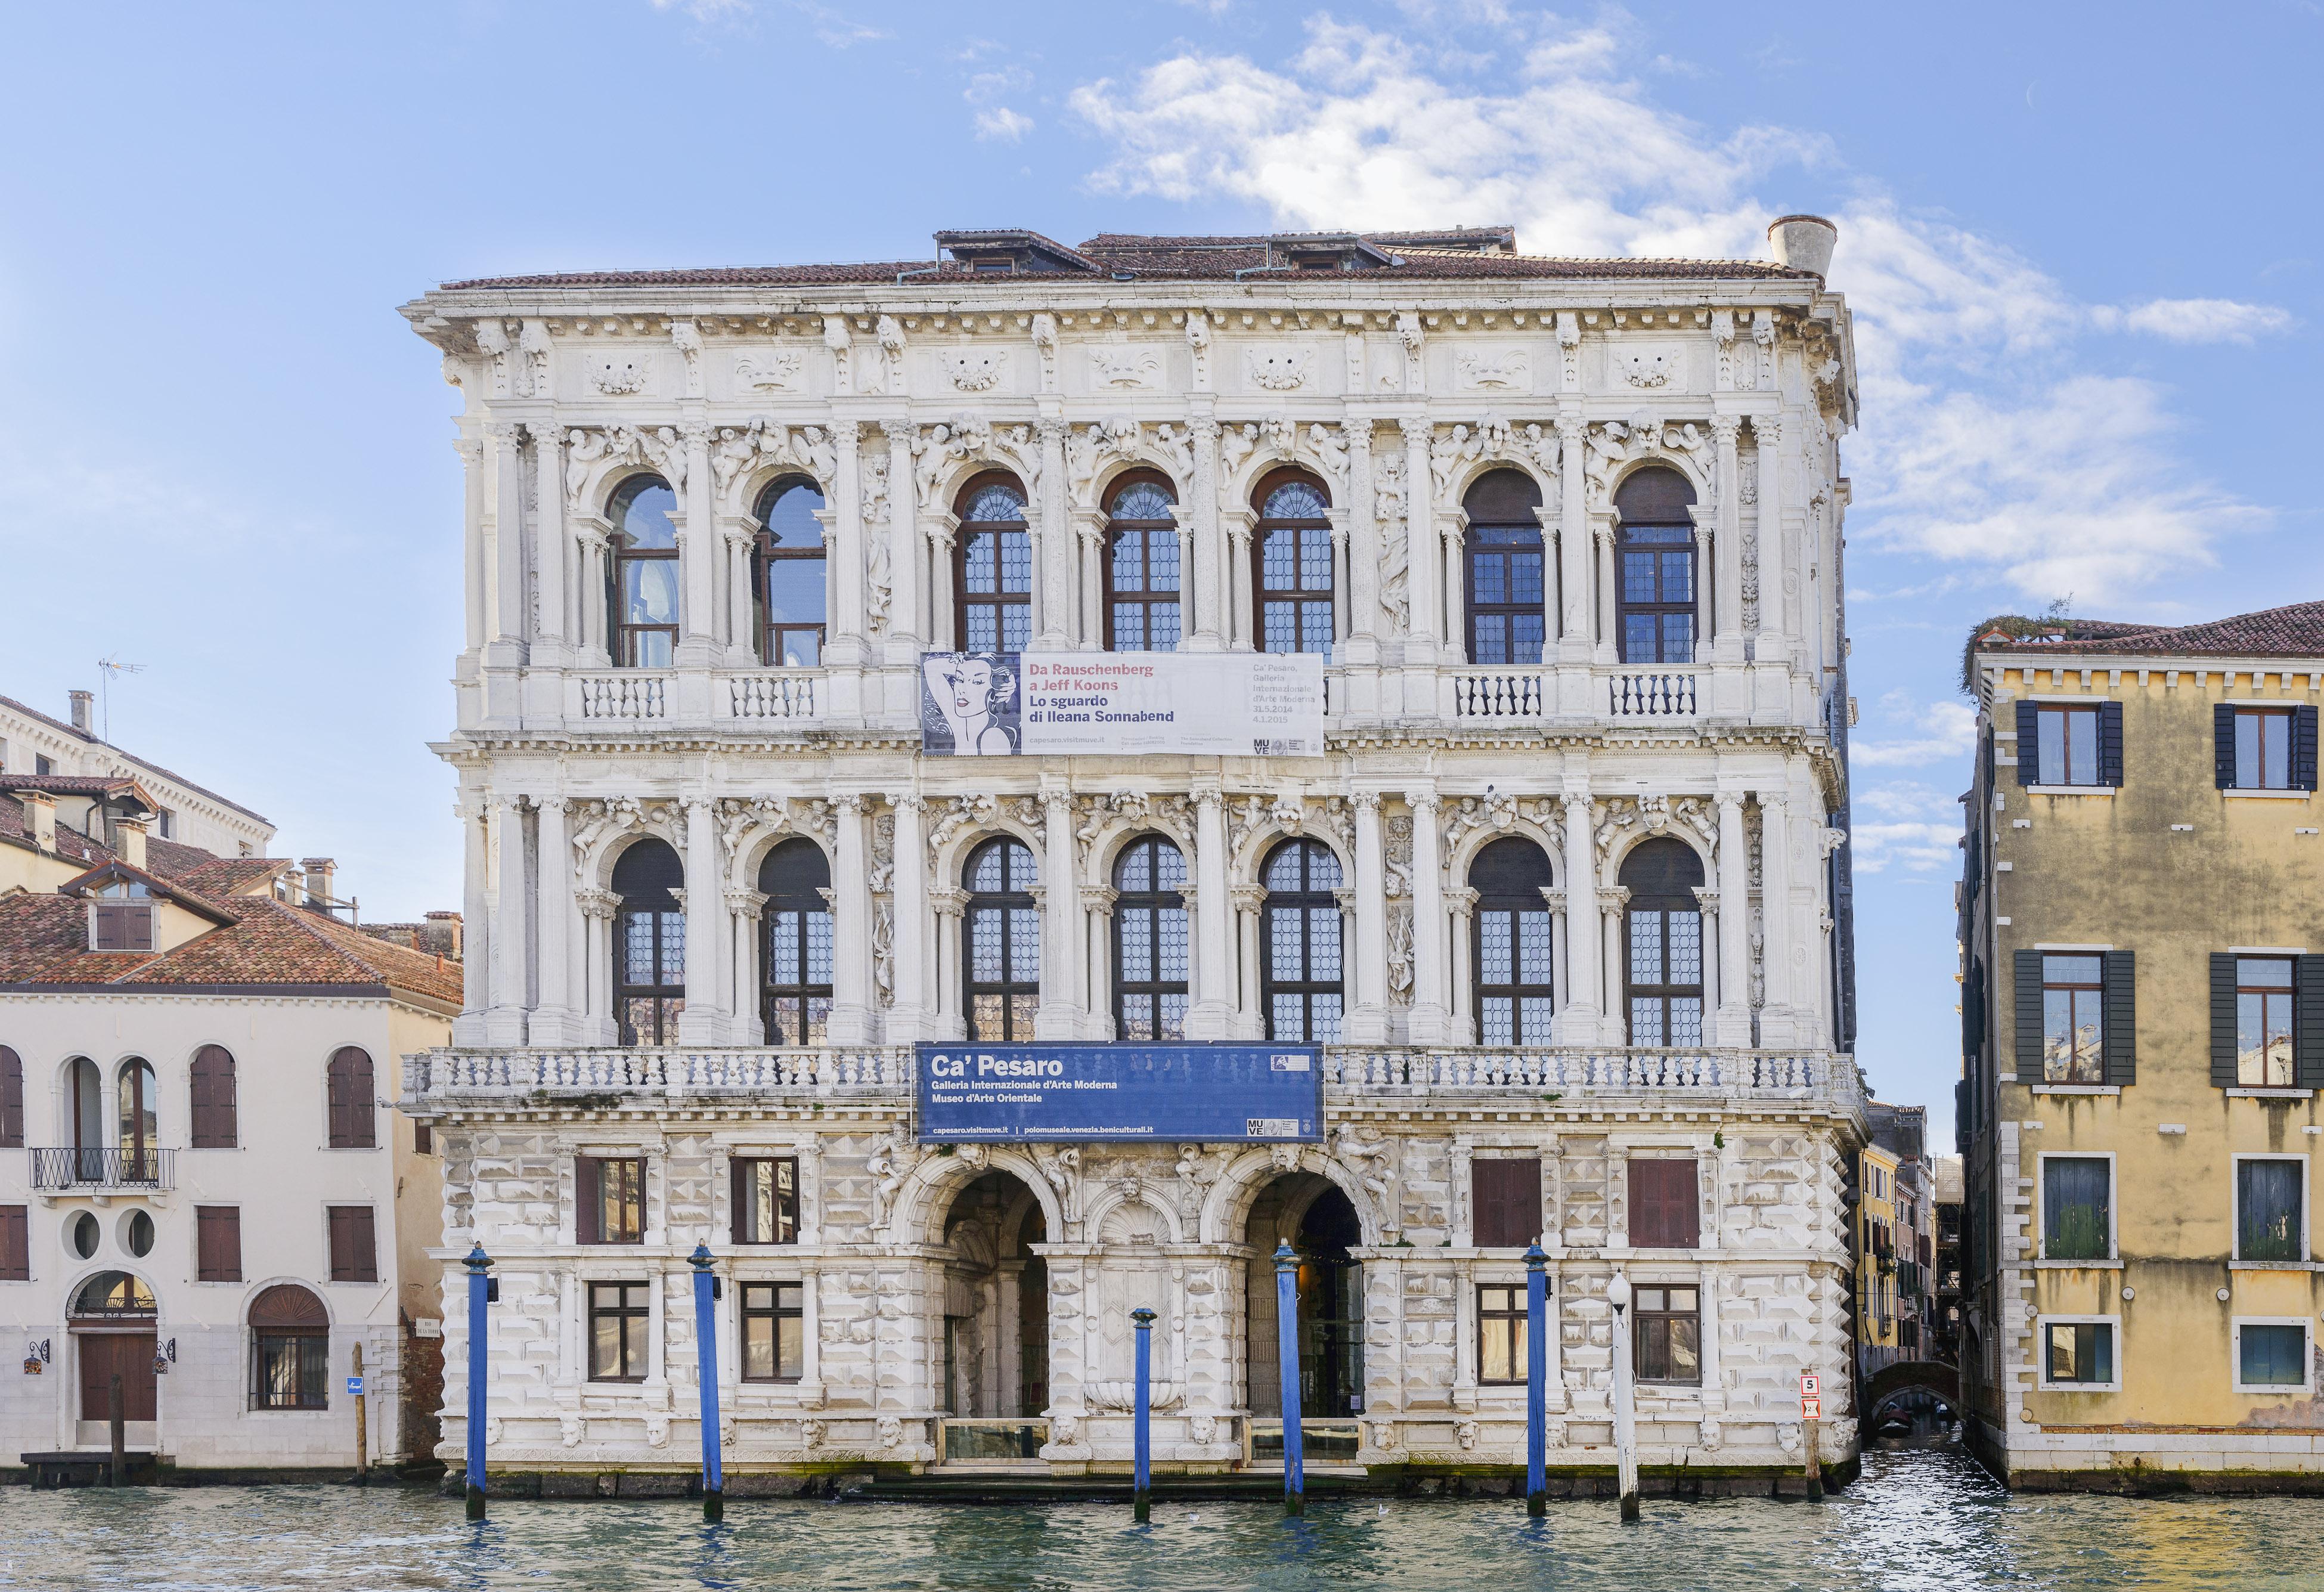 Ca' Pesaro – Galleria Internazionale di Arte Moderna - esterno facciata